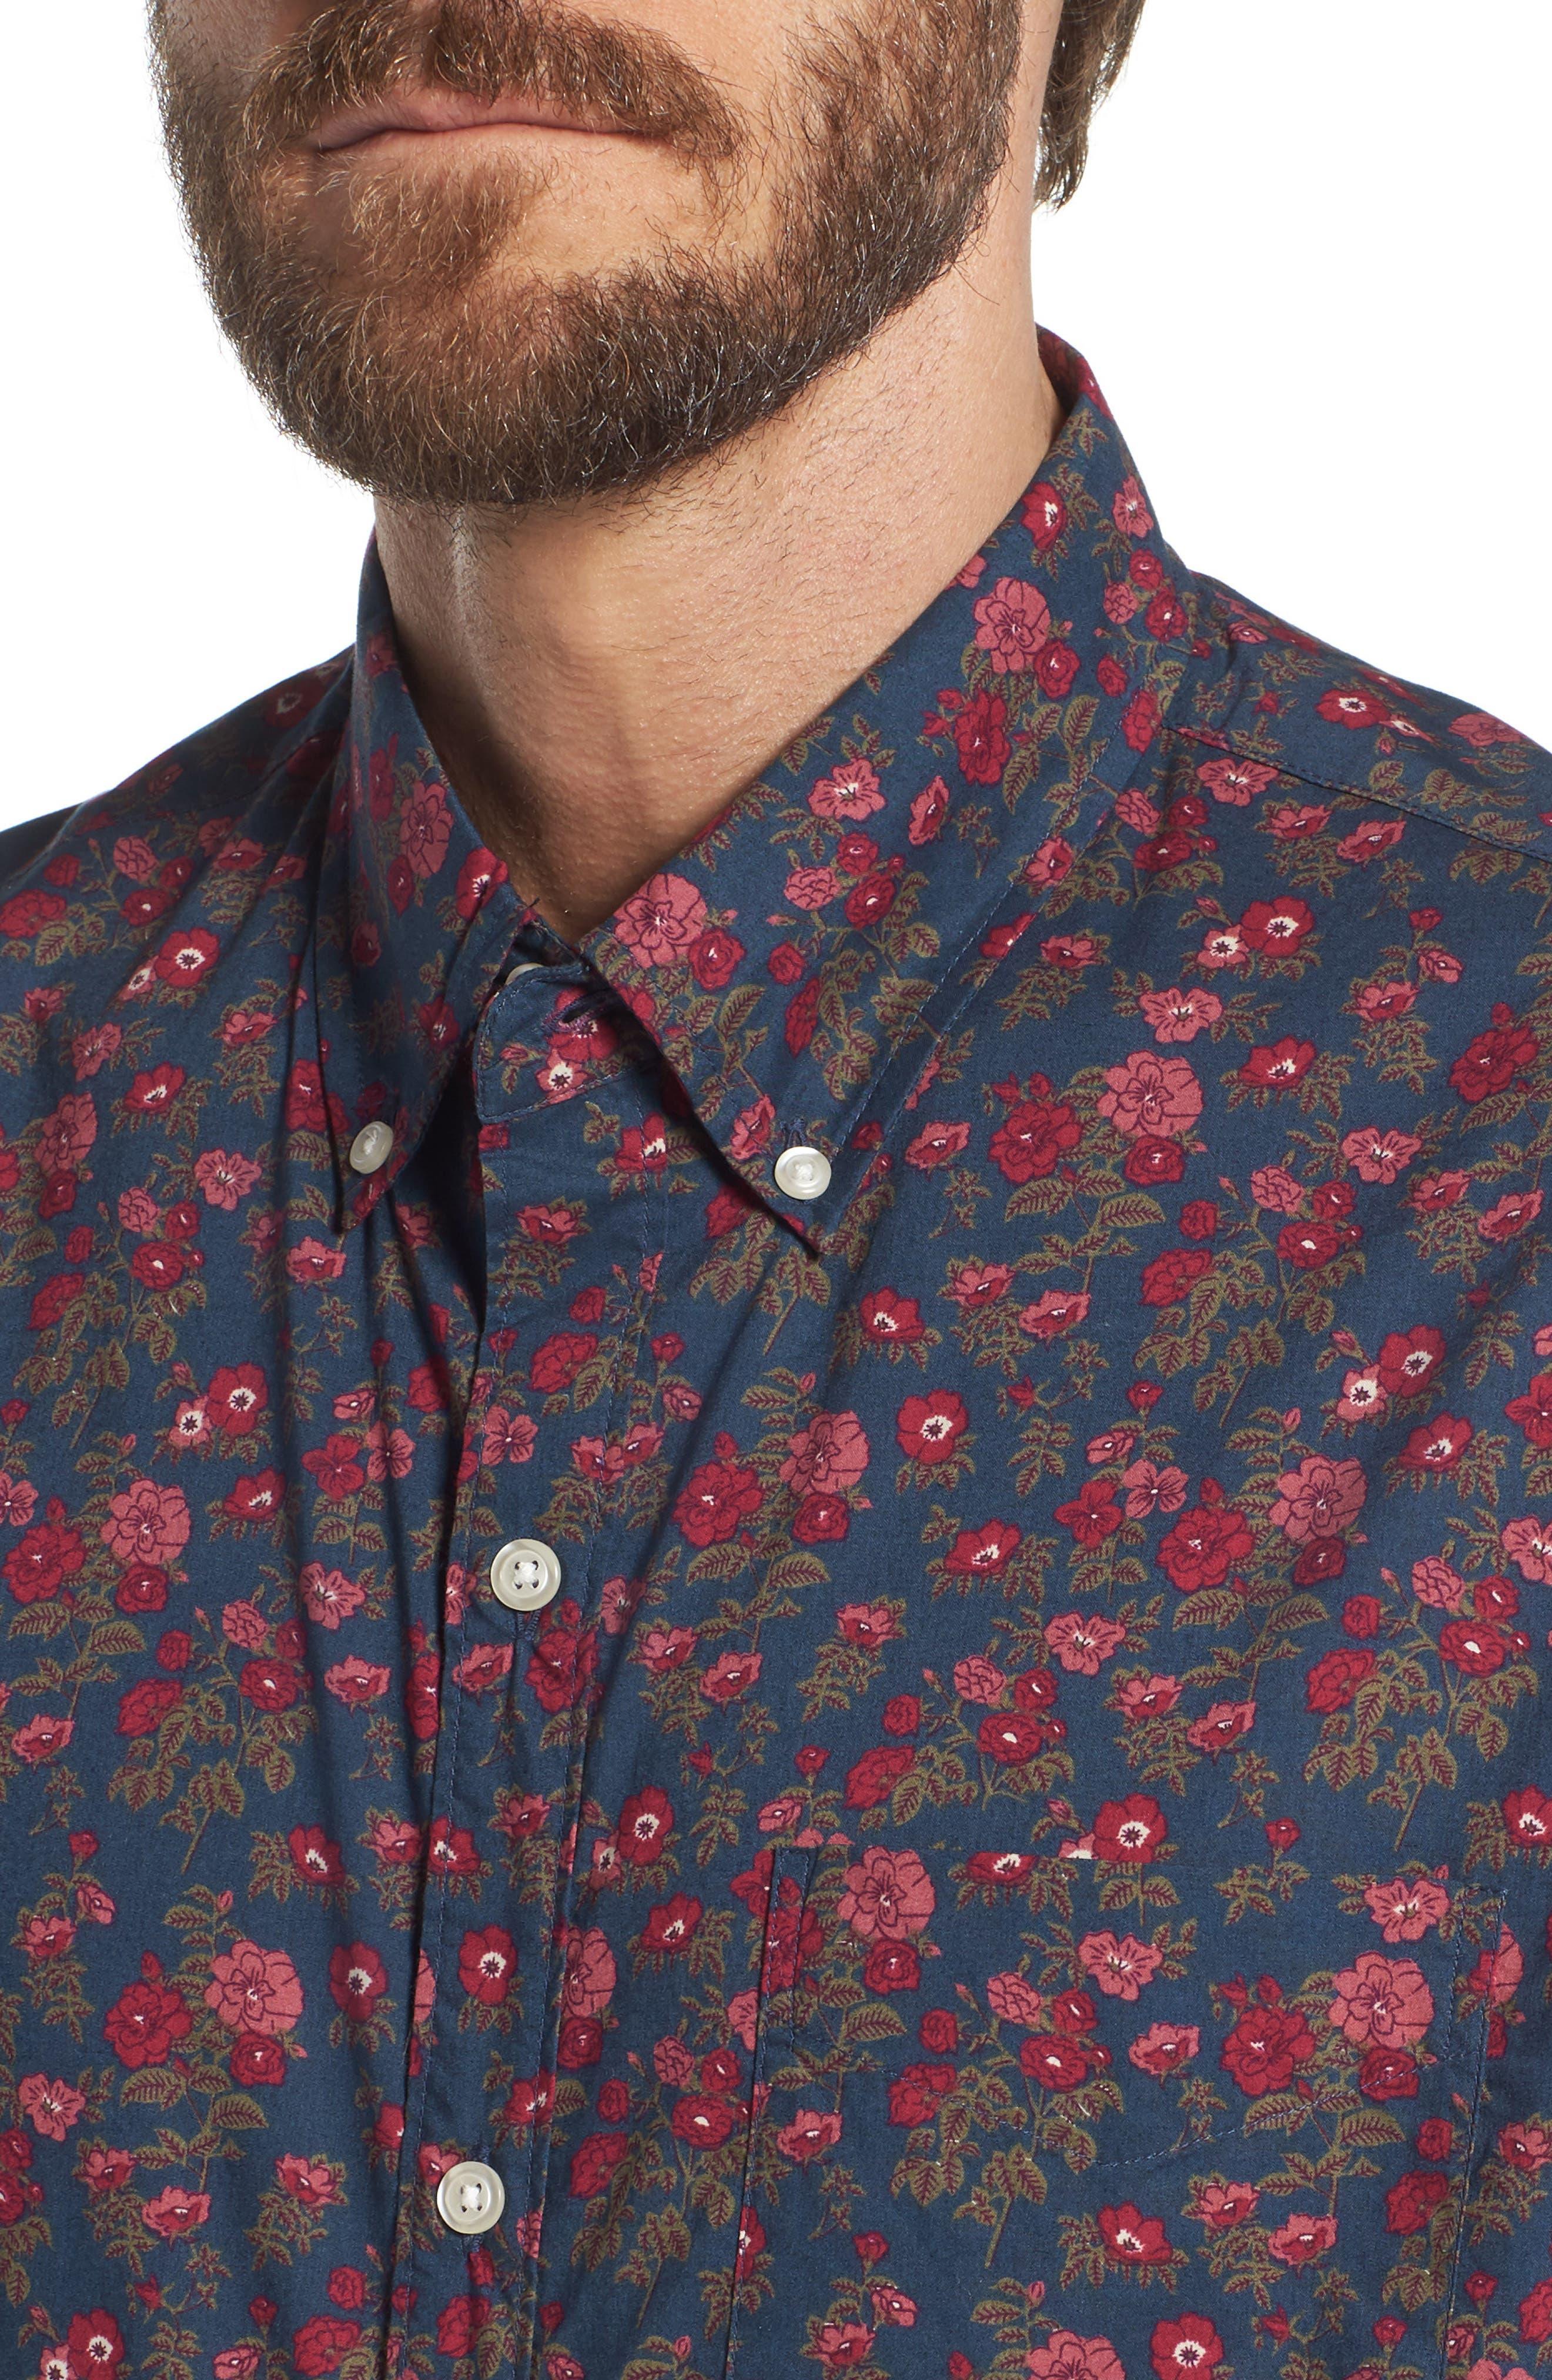 Riviera Slim Fit Floral Print Sport Shirt,                             Alternate thumbnail 2, color,                             Dandy Floral - Pickled Beet